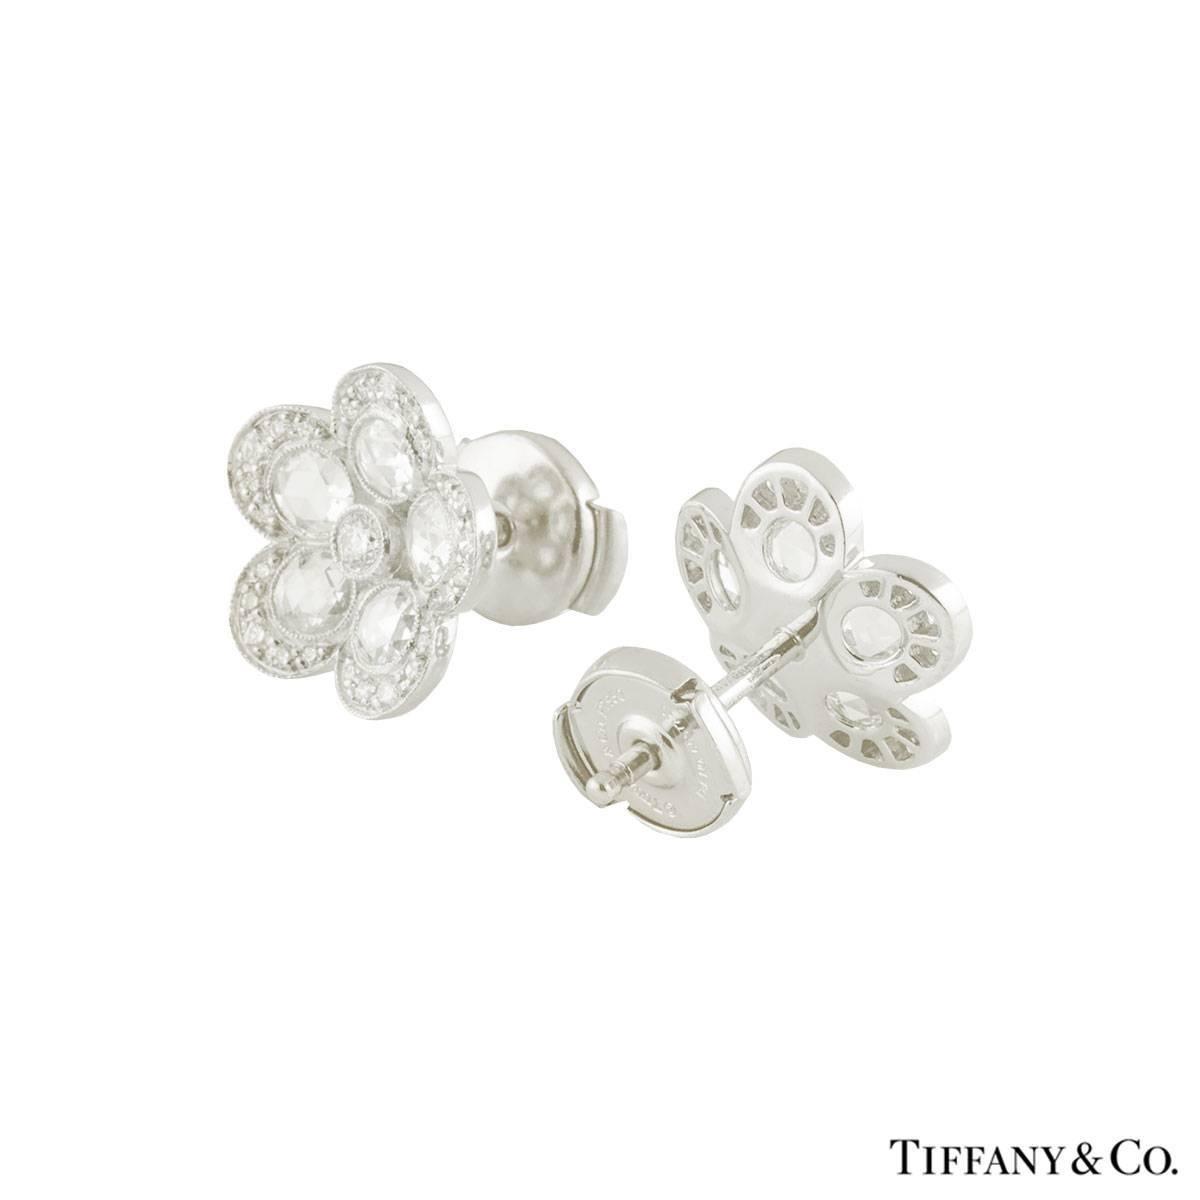 Tiffany And Co Platinum Diamond Garden Flower Earrings At